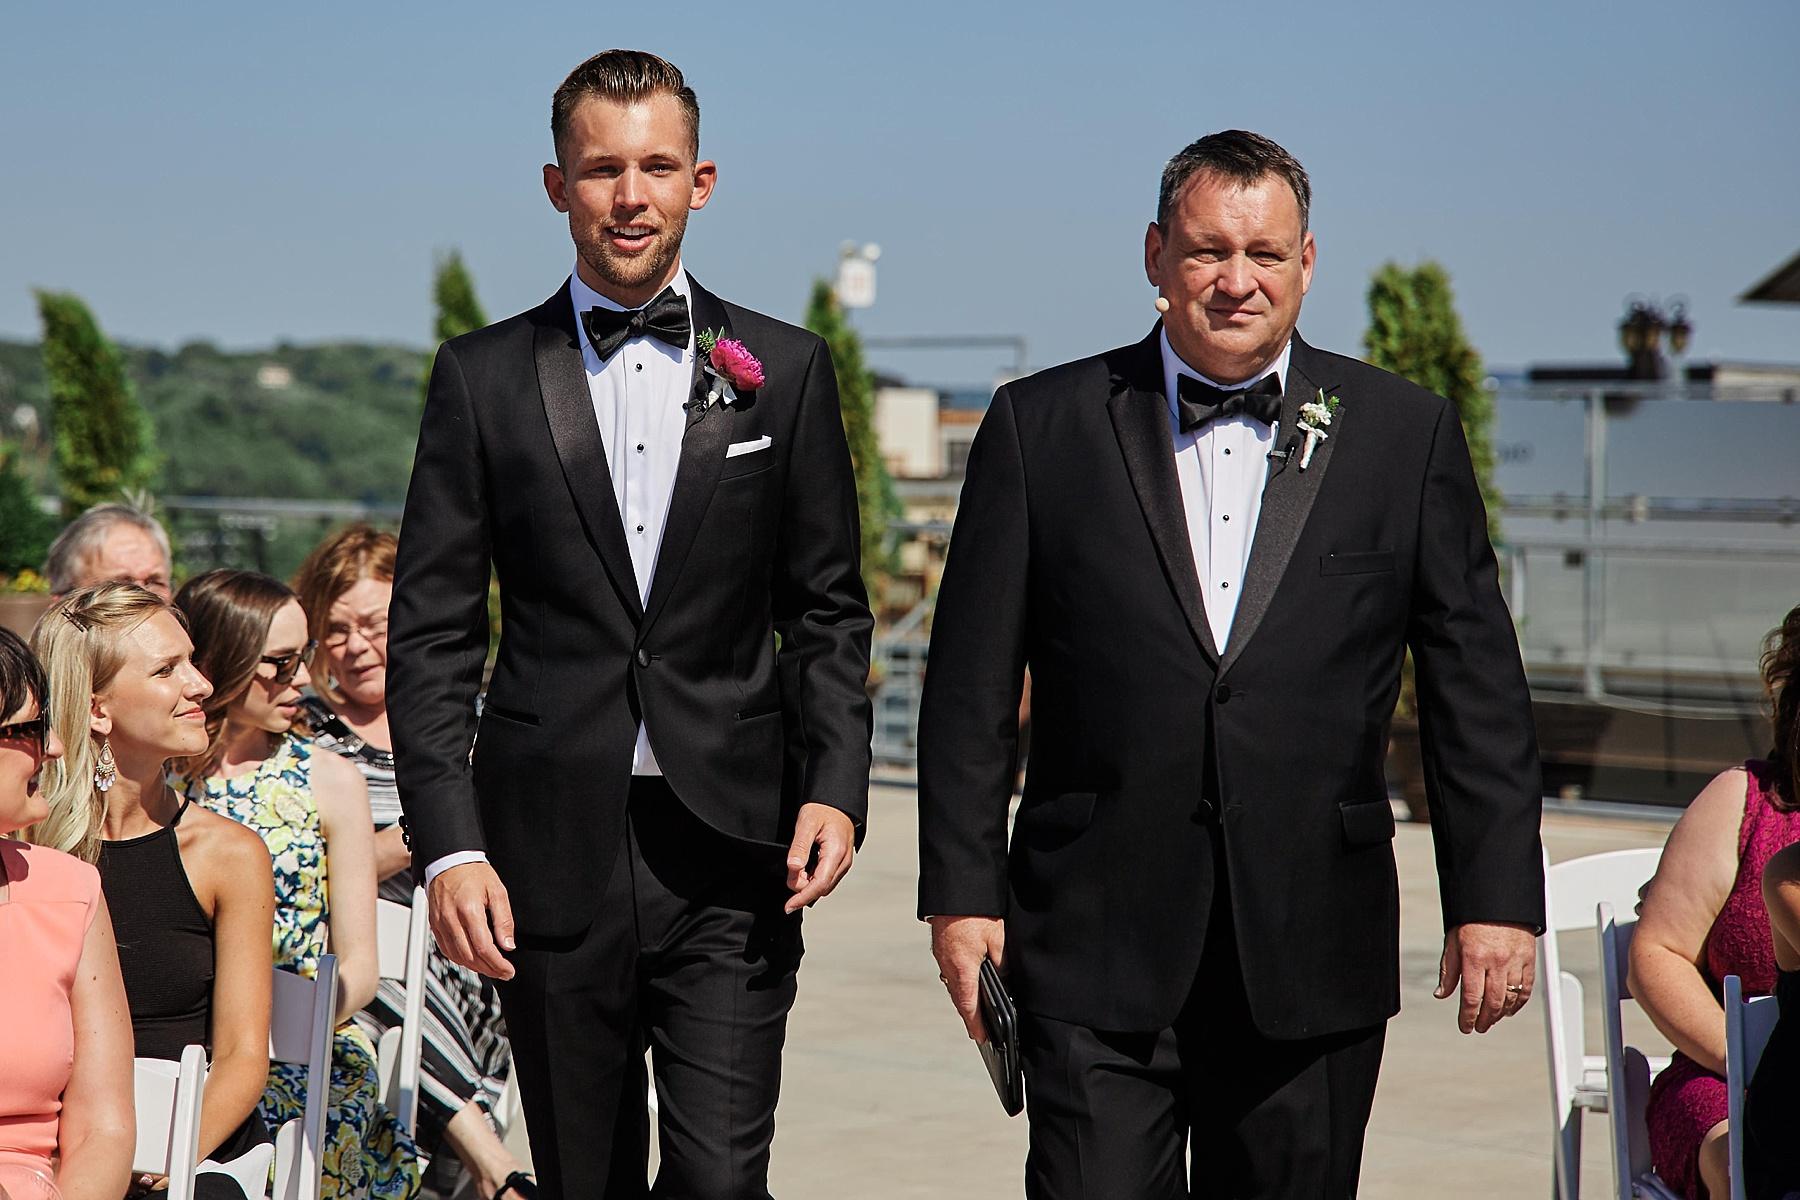 ABULAE-Wedding-Saint-paul-MN-Josh-Sofia-Wedding-Mears-Park_0743.jpg